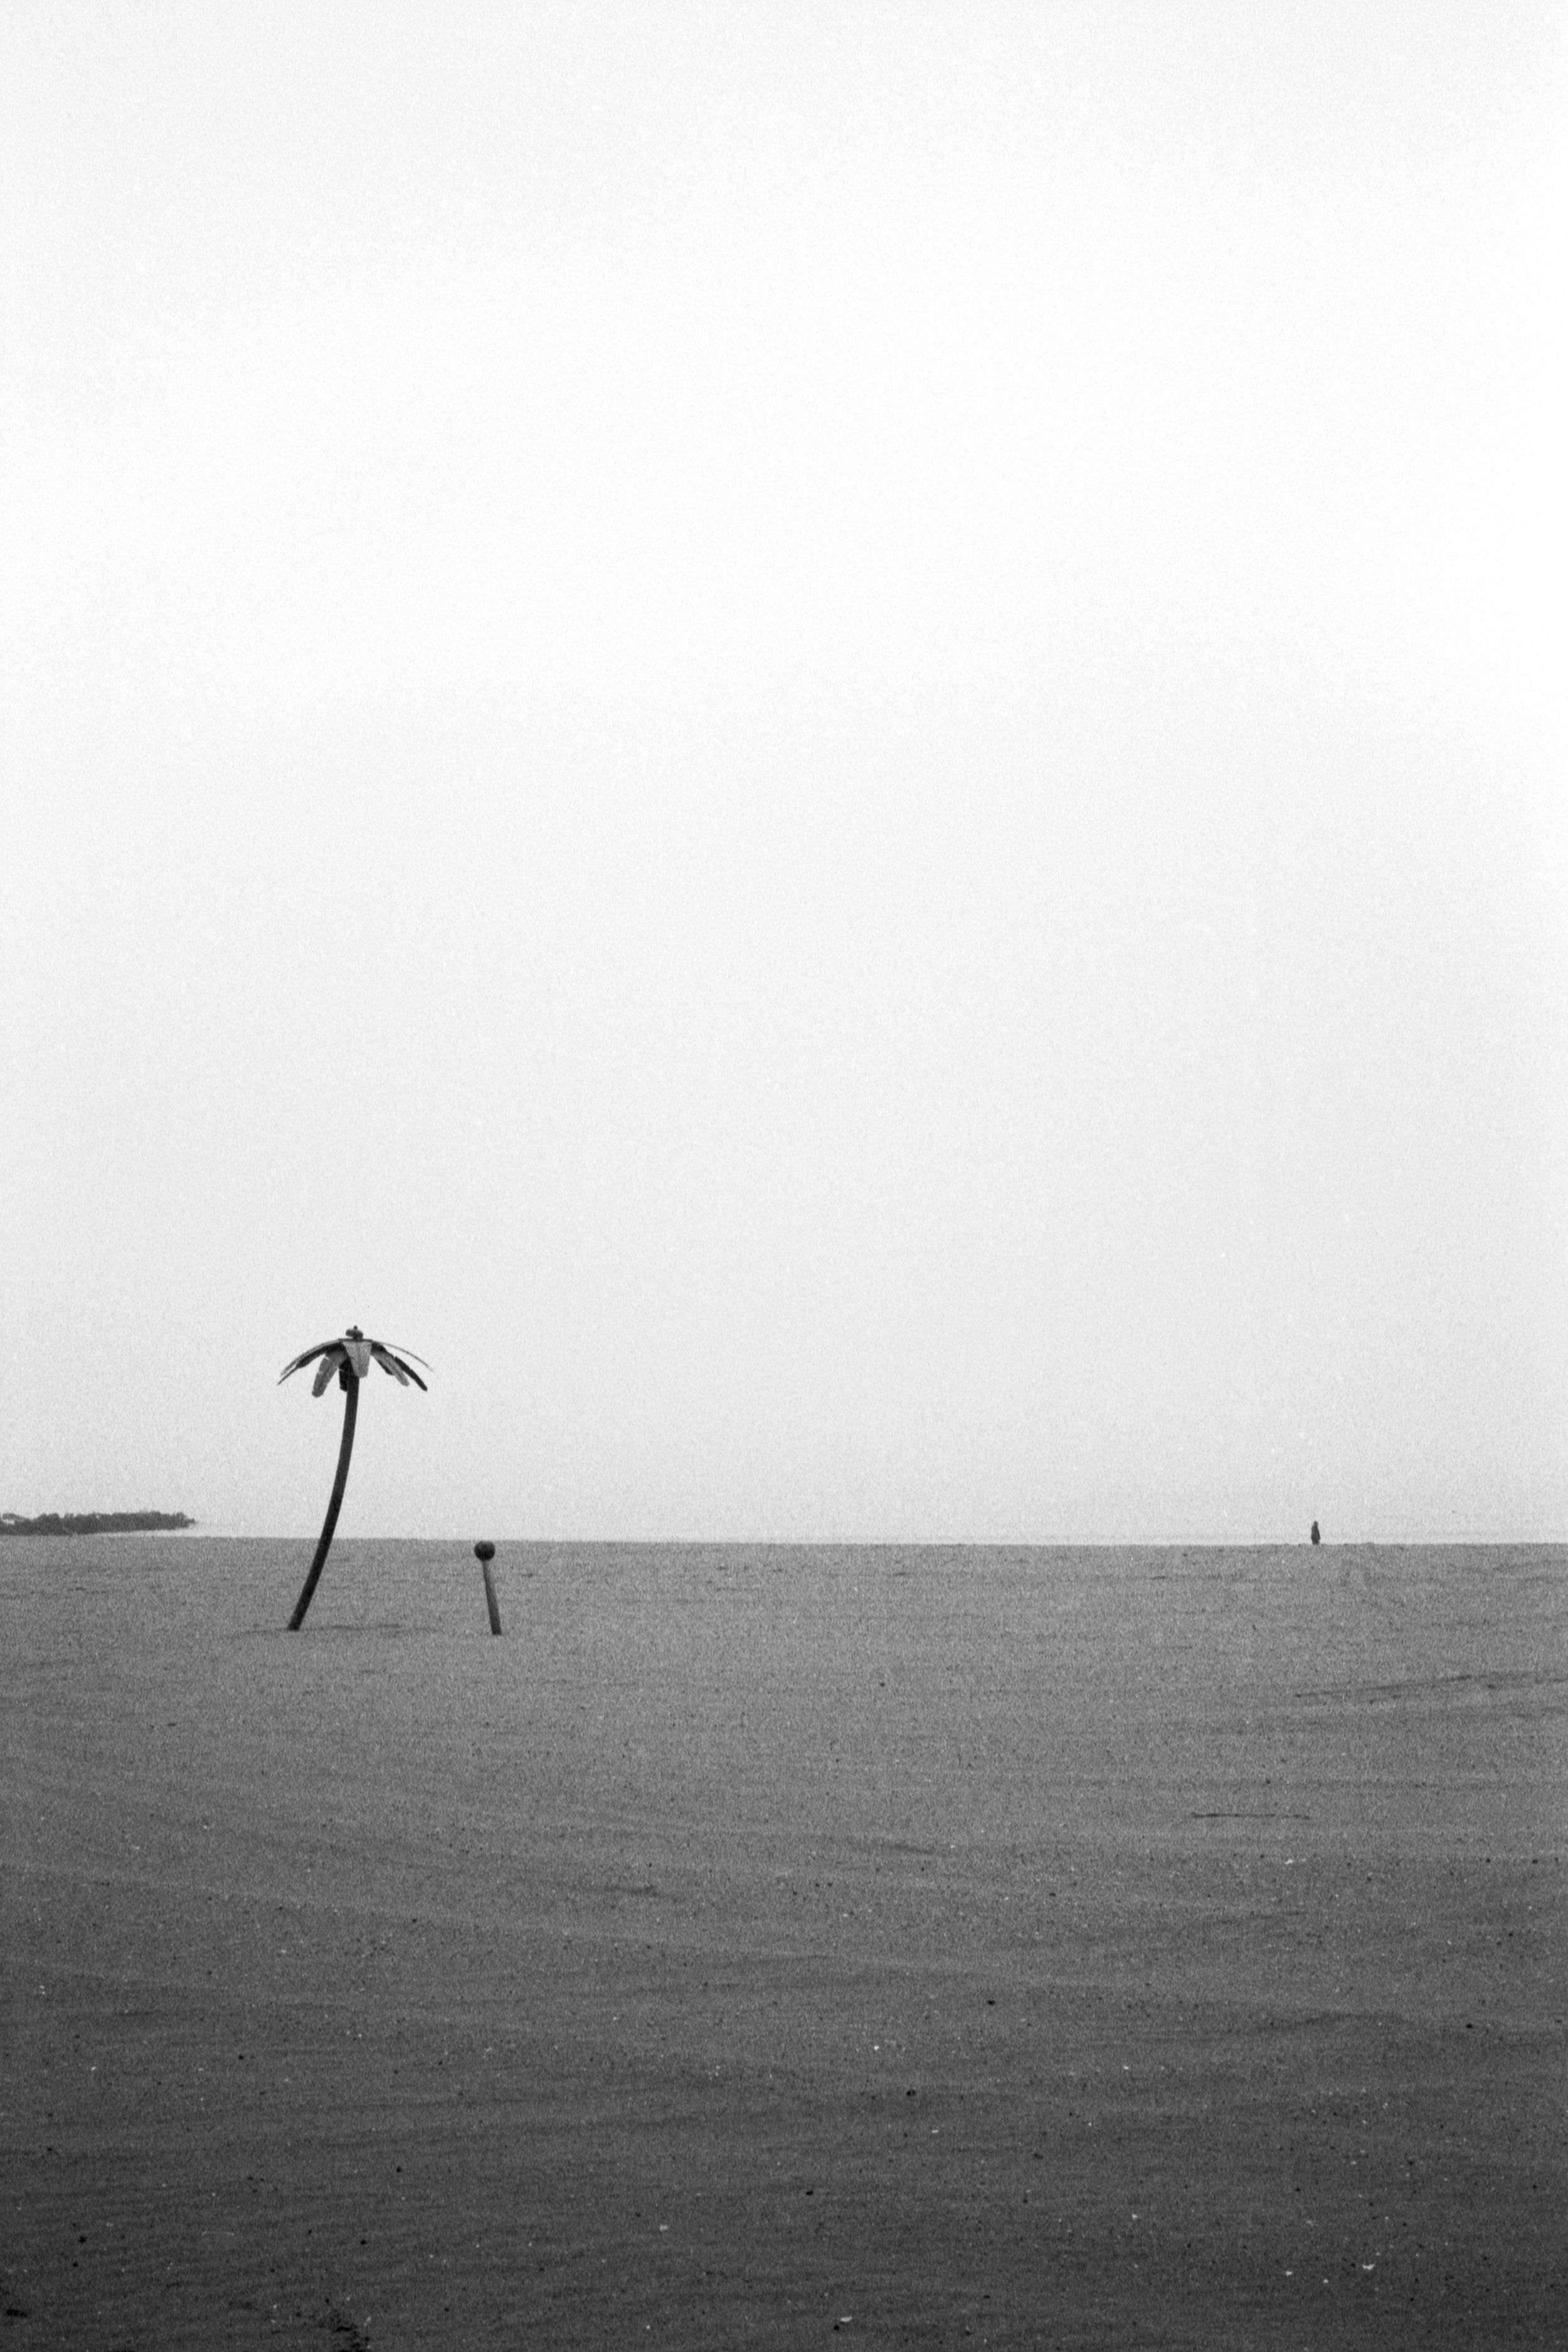 LeicaM6_1901_Deal052-Edit.jpg